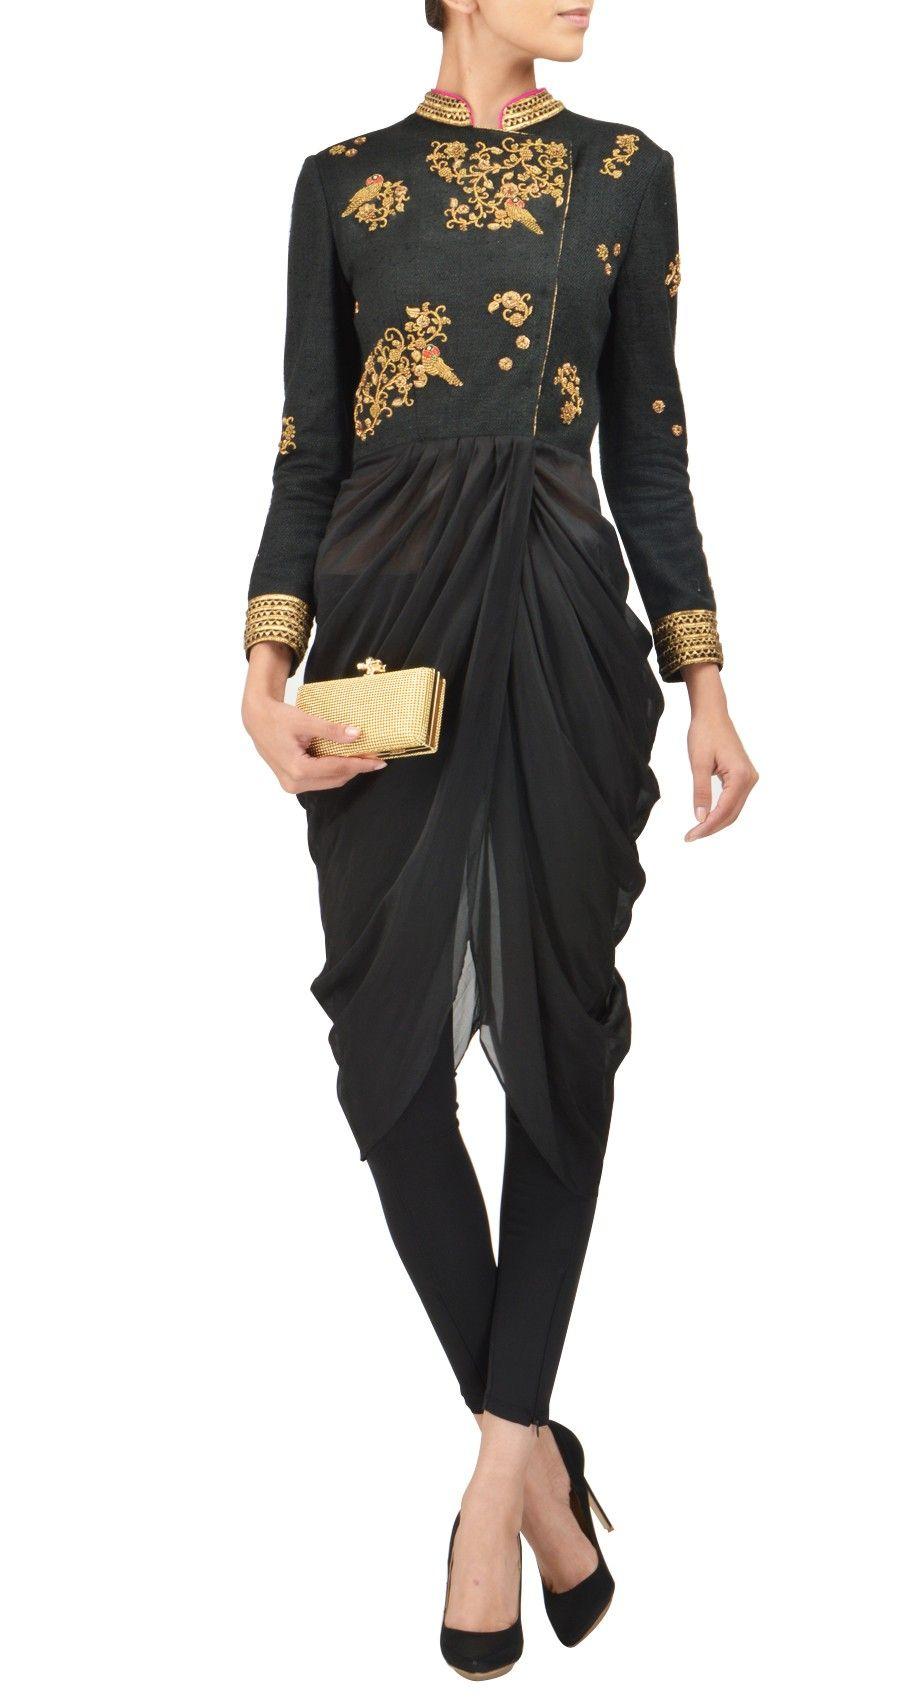 Tisha Saksena; love the top bit....the bottom not so much